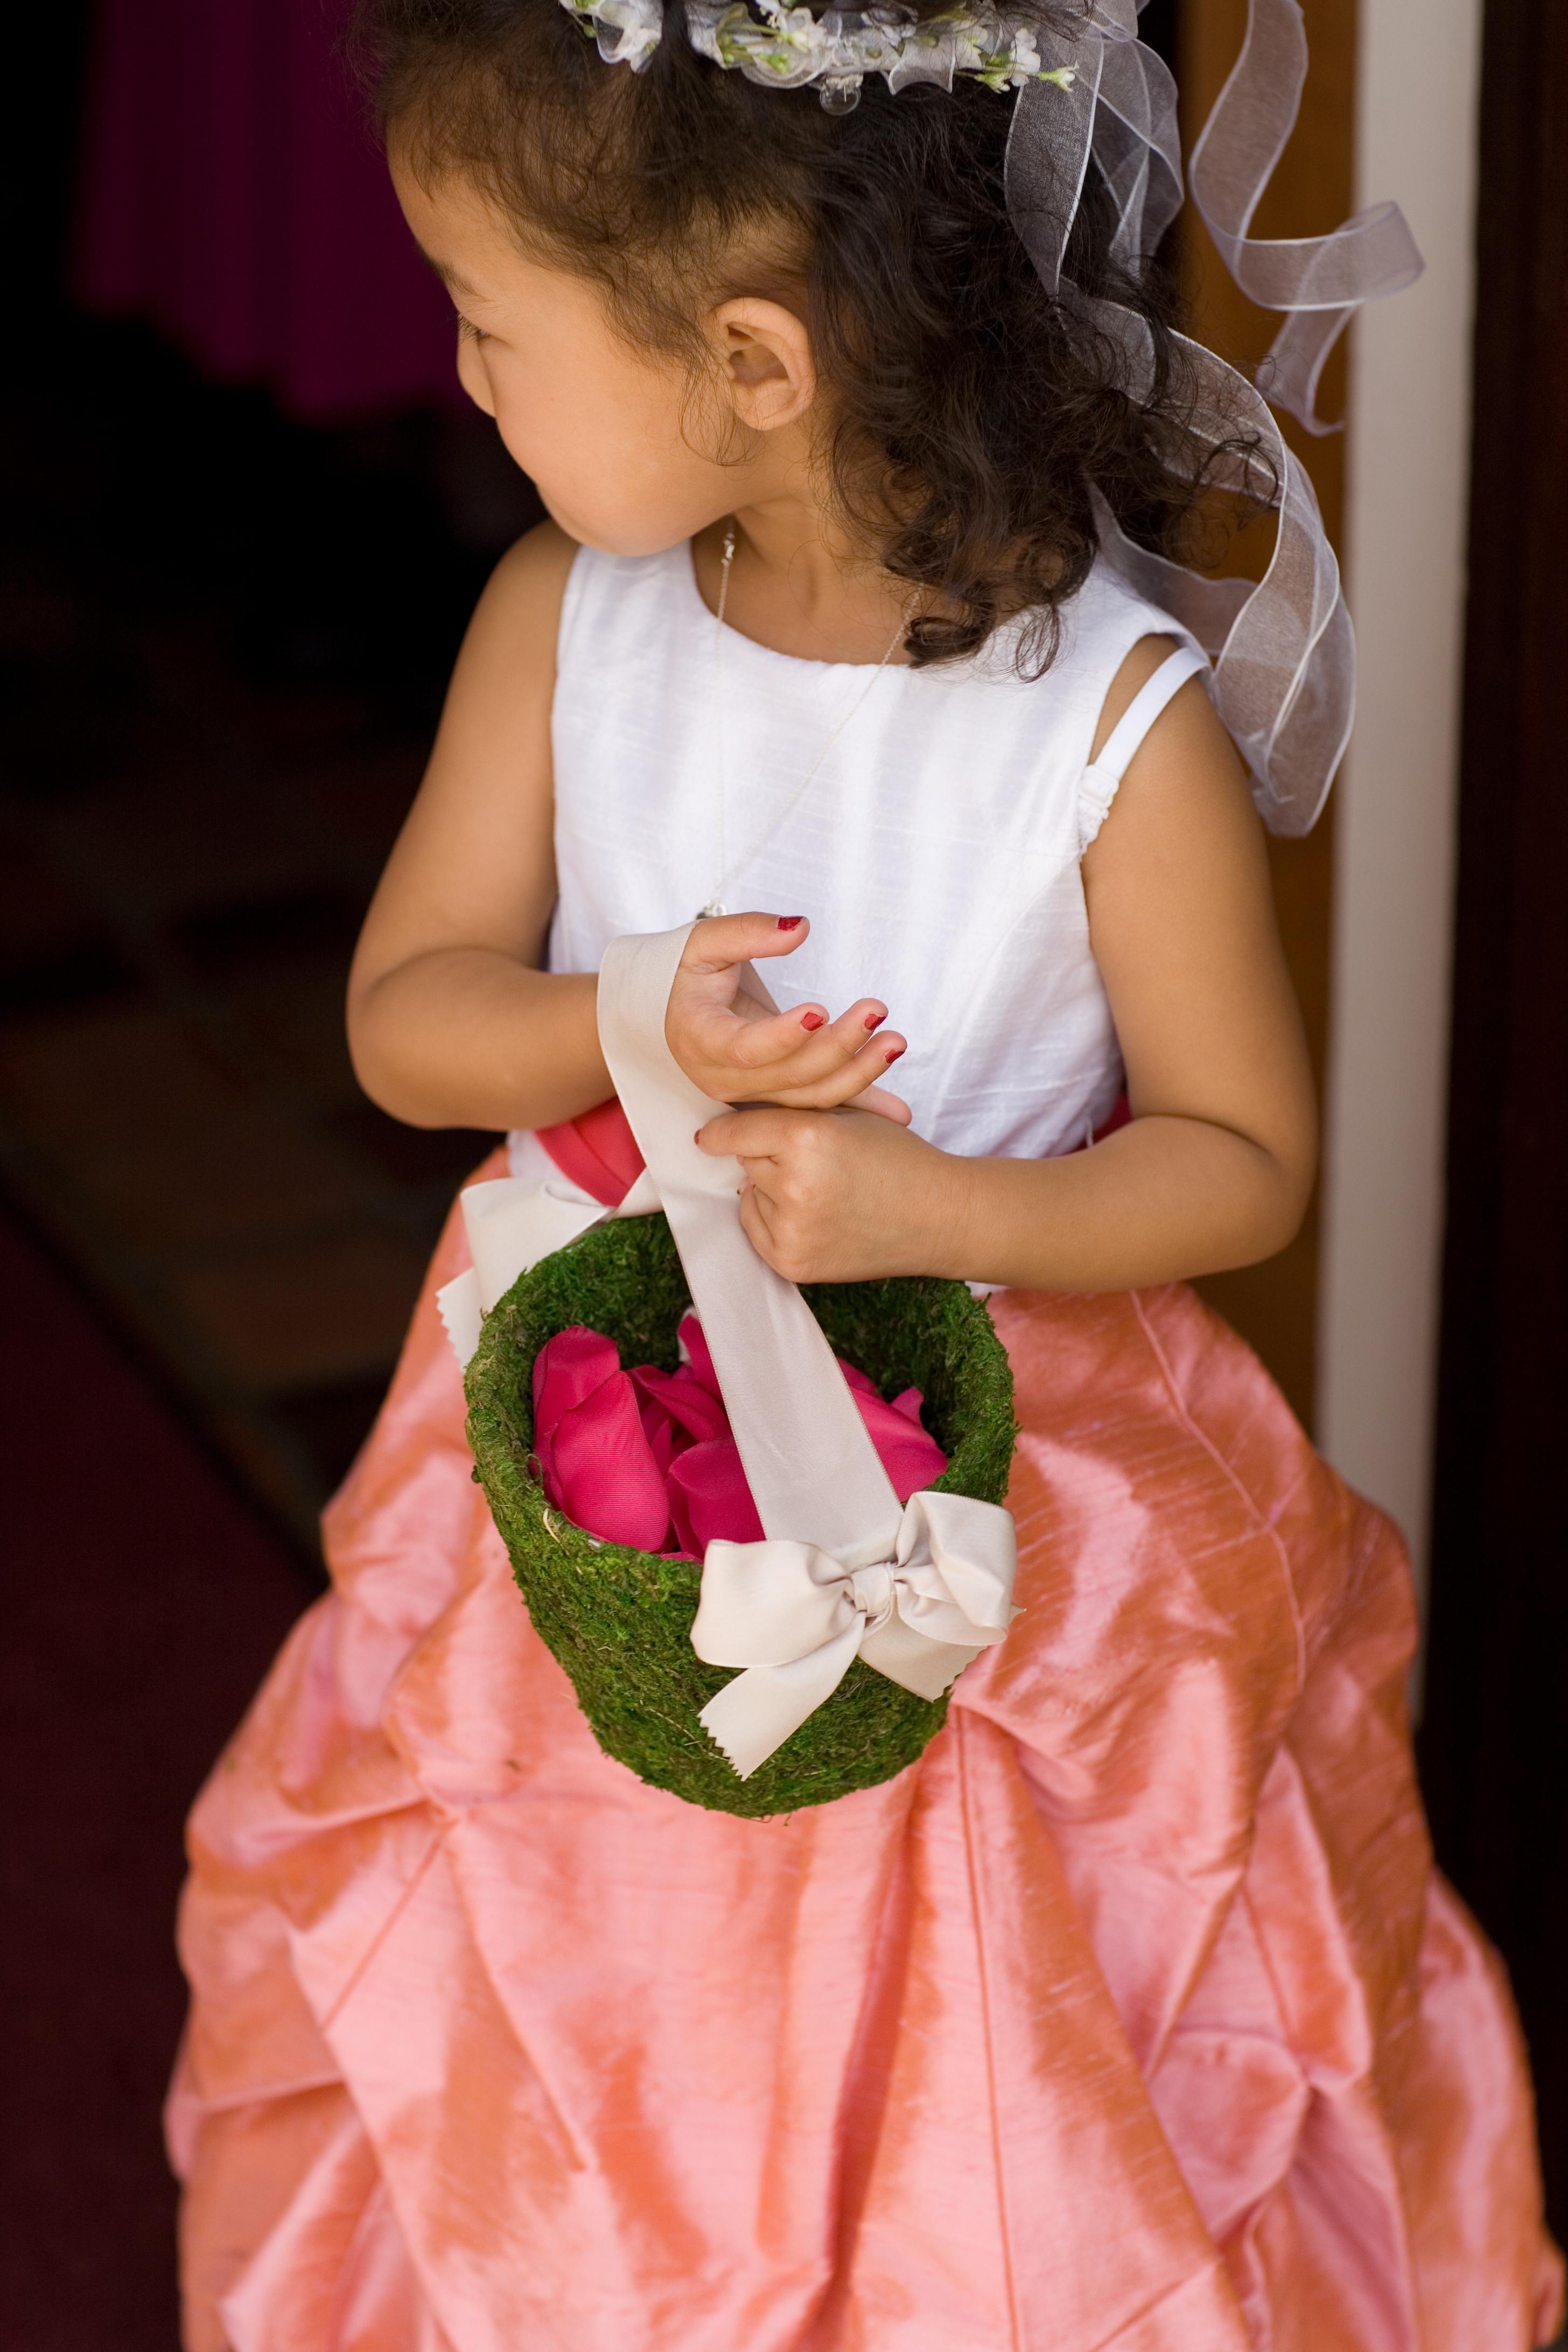 Beauty, Ceremony, Inspiration, Flowers & Decor, Flower Girl Dresses, Wedding Dresses, Fashion, pink, dress, Ceremony Flowers, Flowers, Hair, Flower girl, Board, Green apple photo, Flower Wedding Dresses